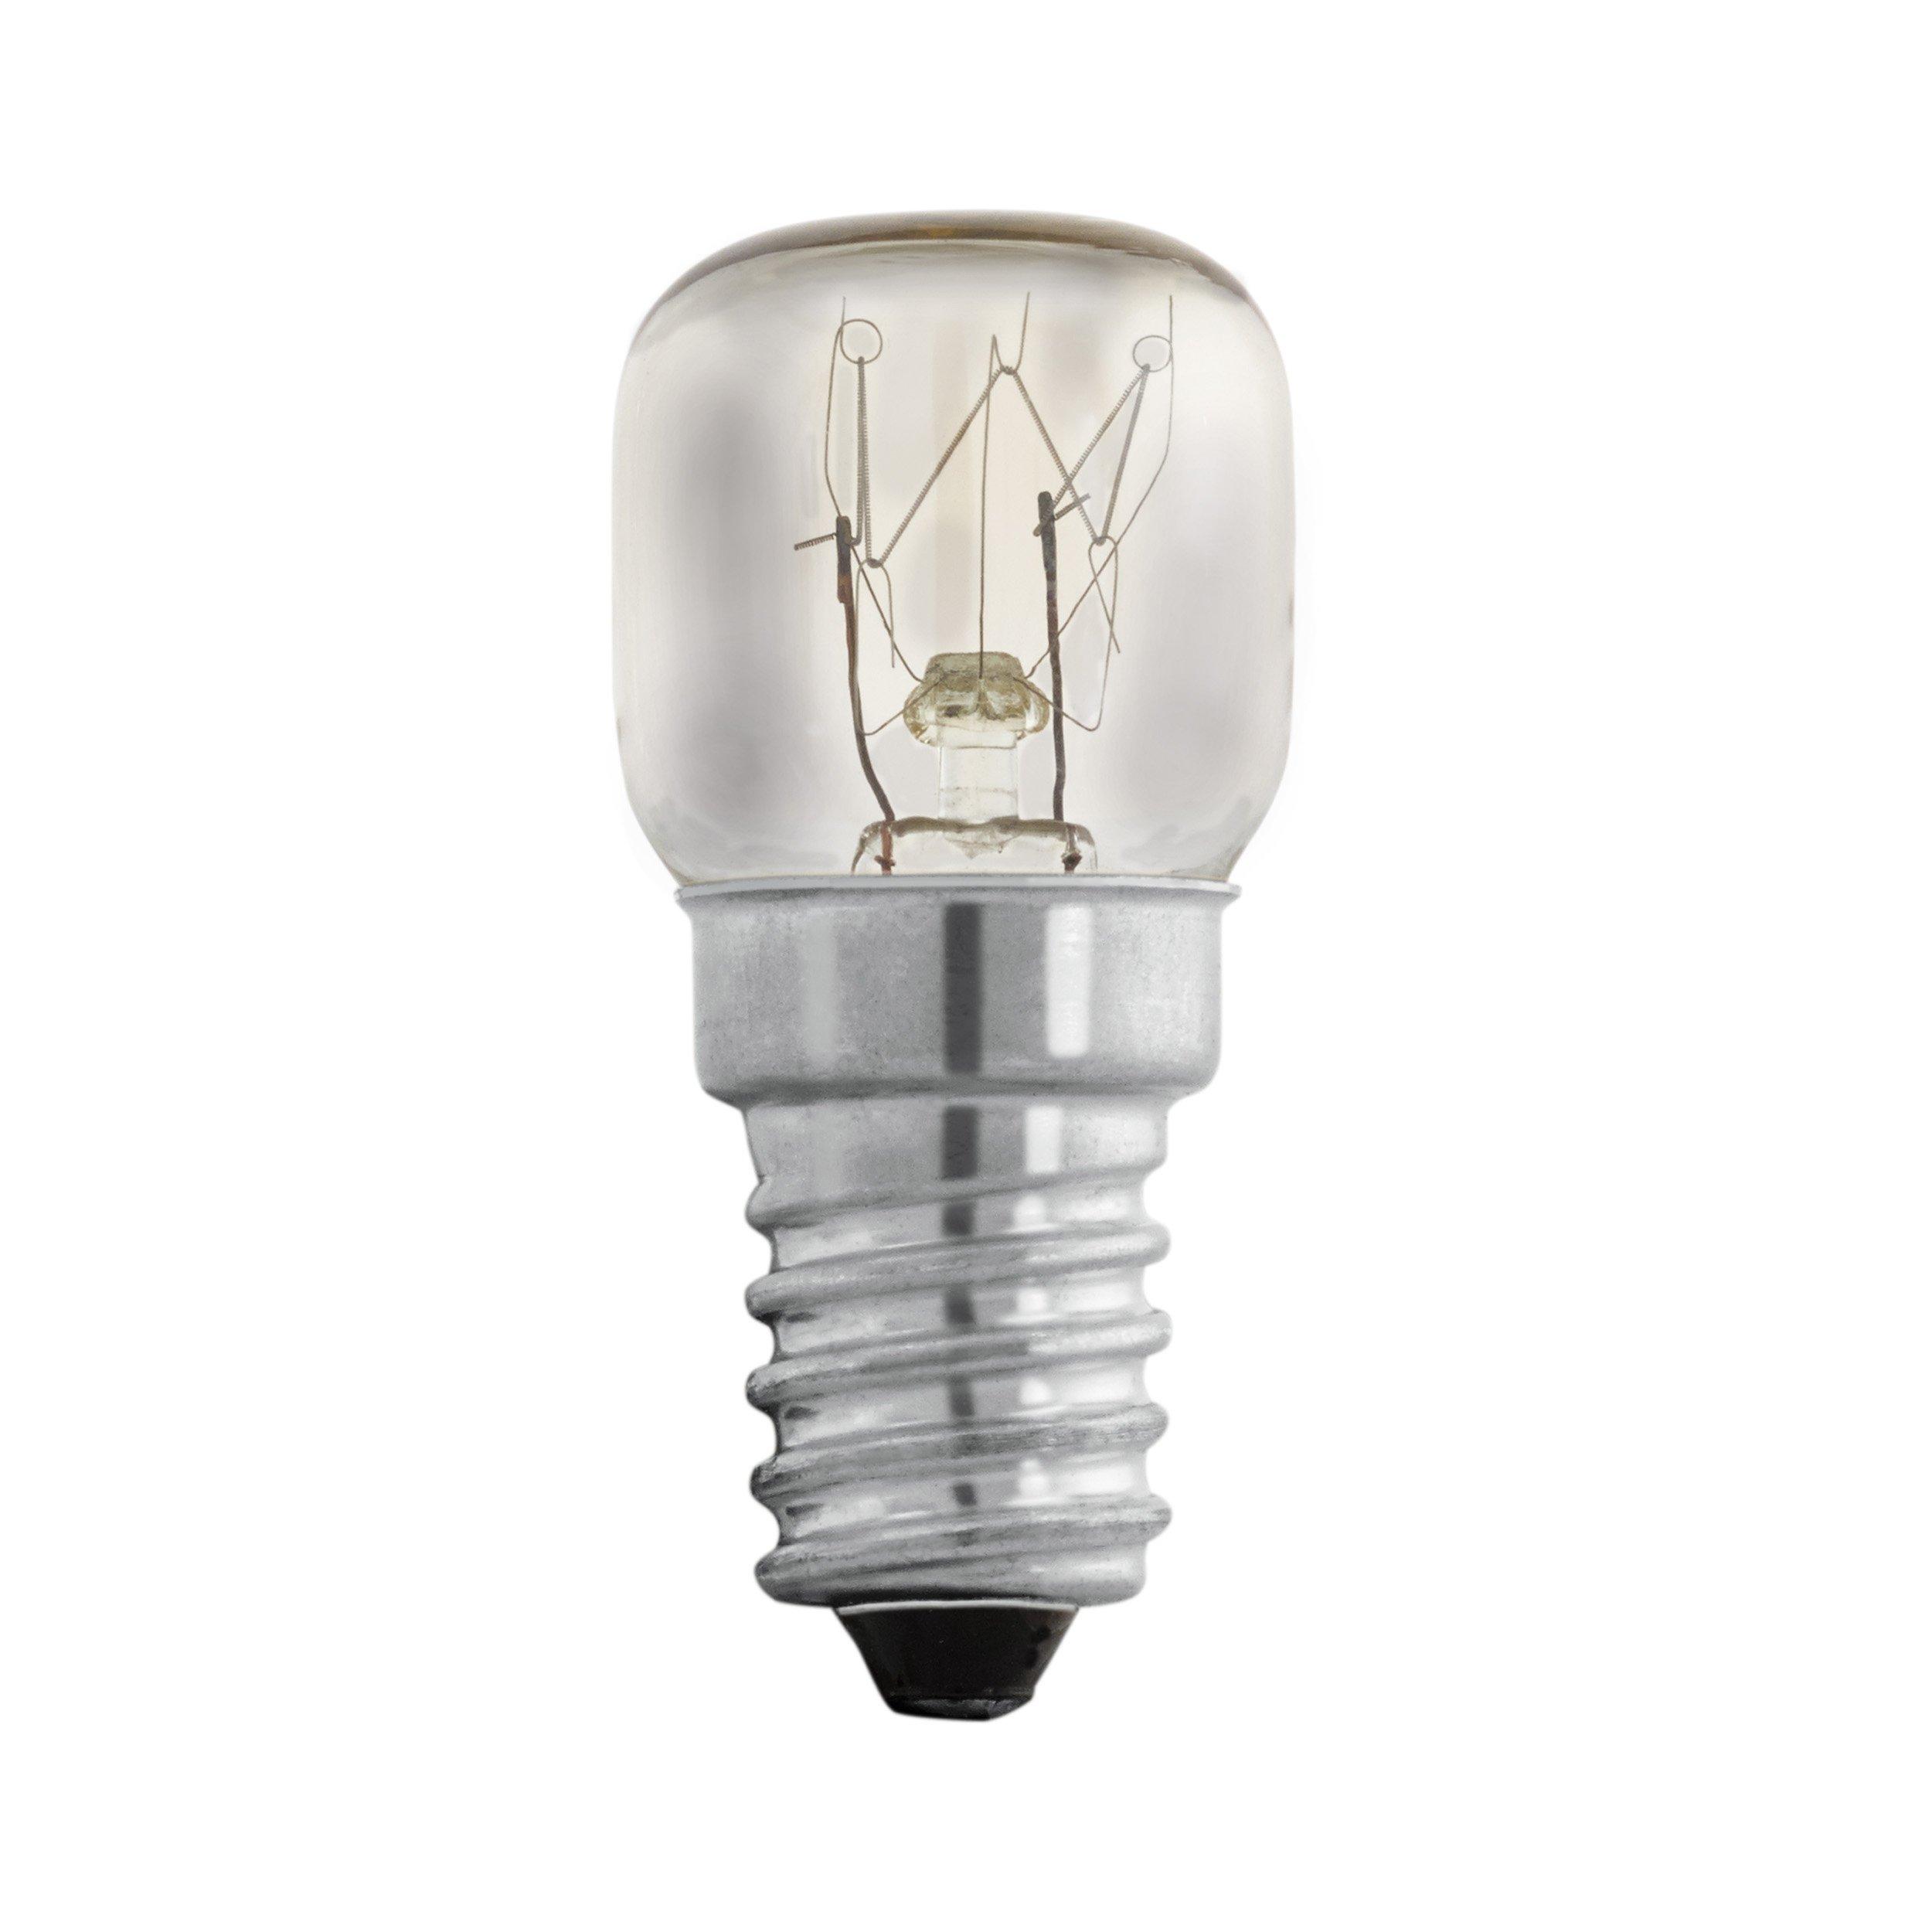 Leuchtmittel LM_HAL_E14